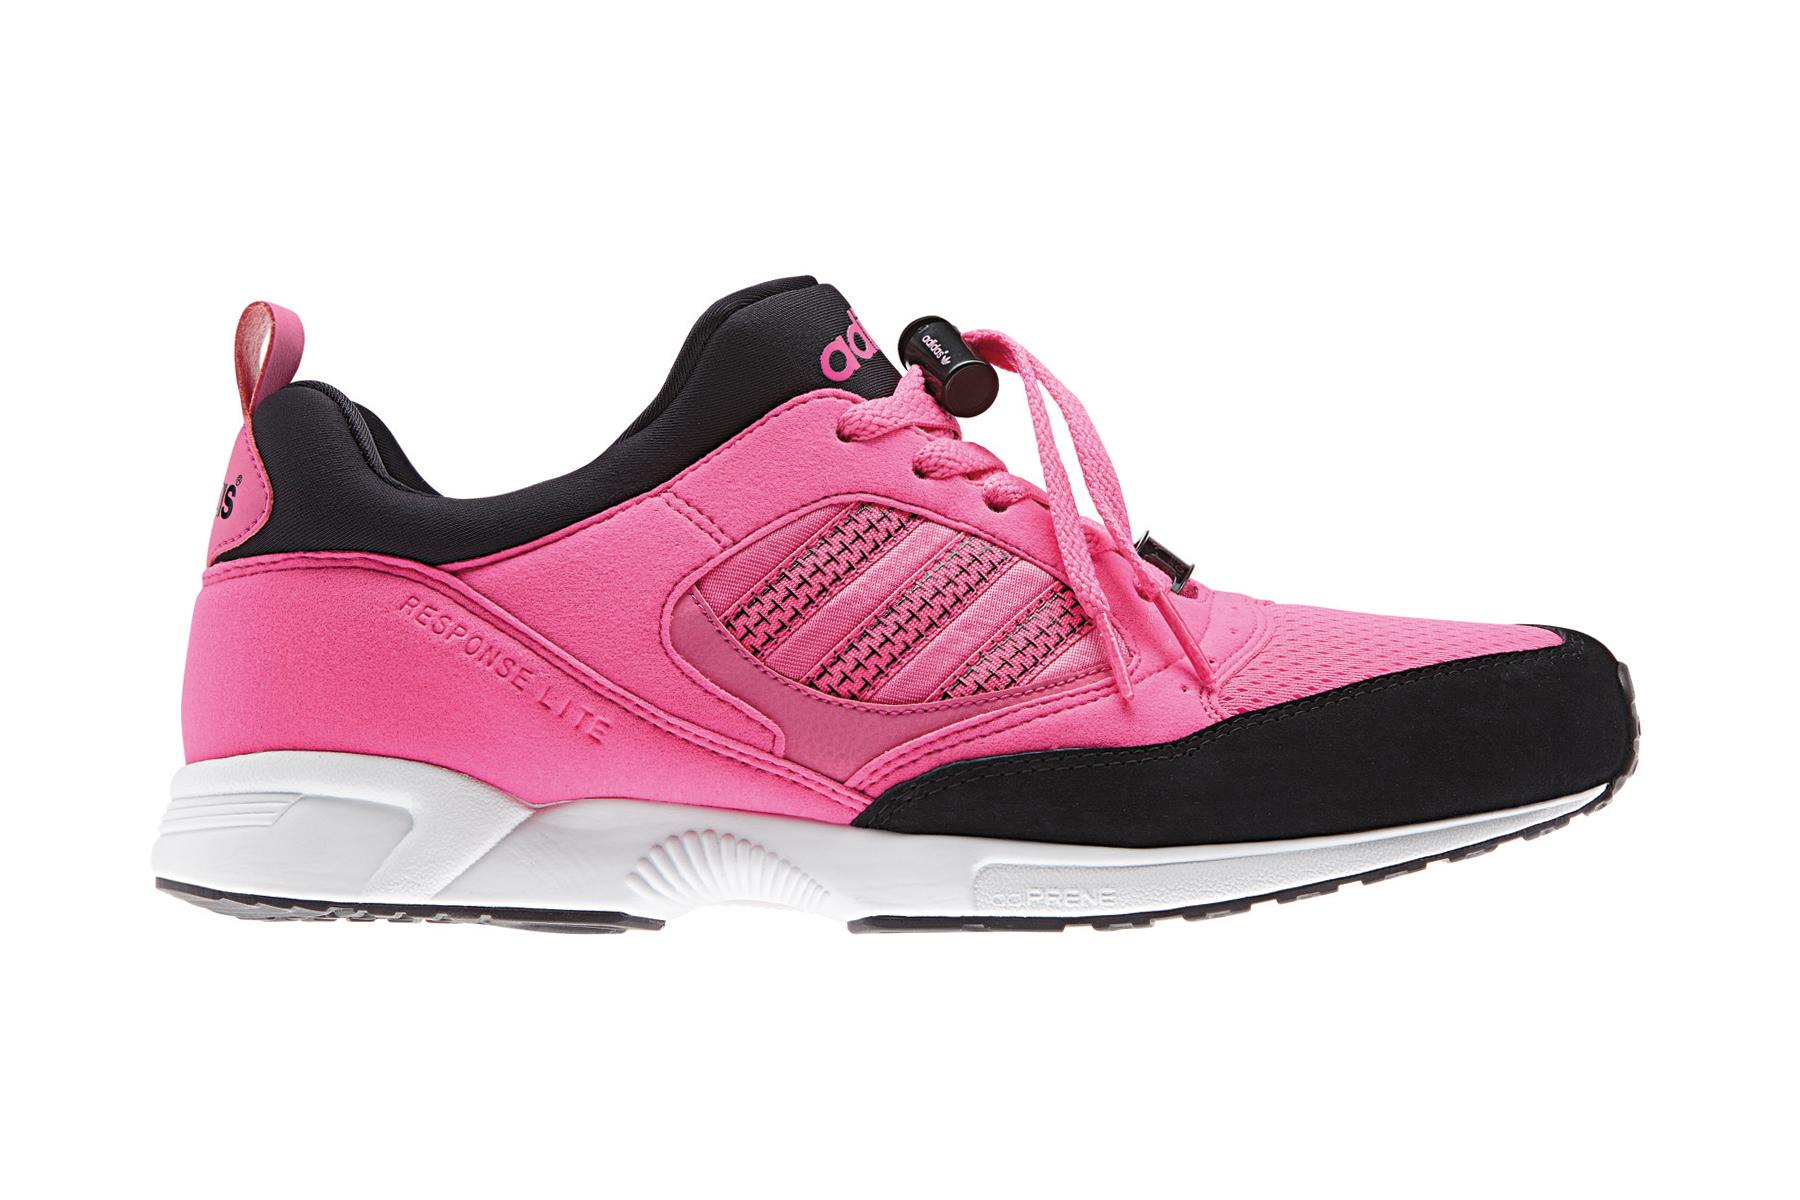 adidas originals 2014 fall winter torsion response lite